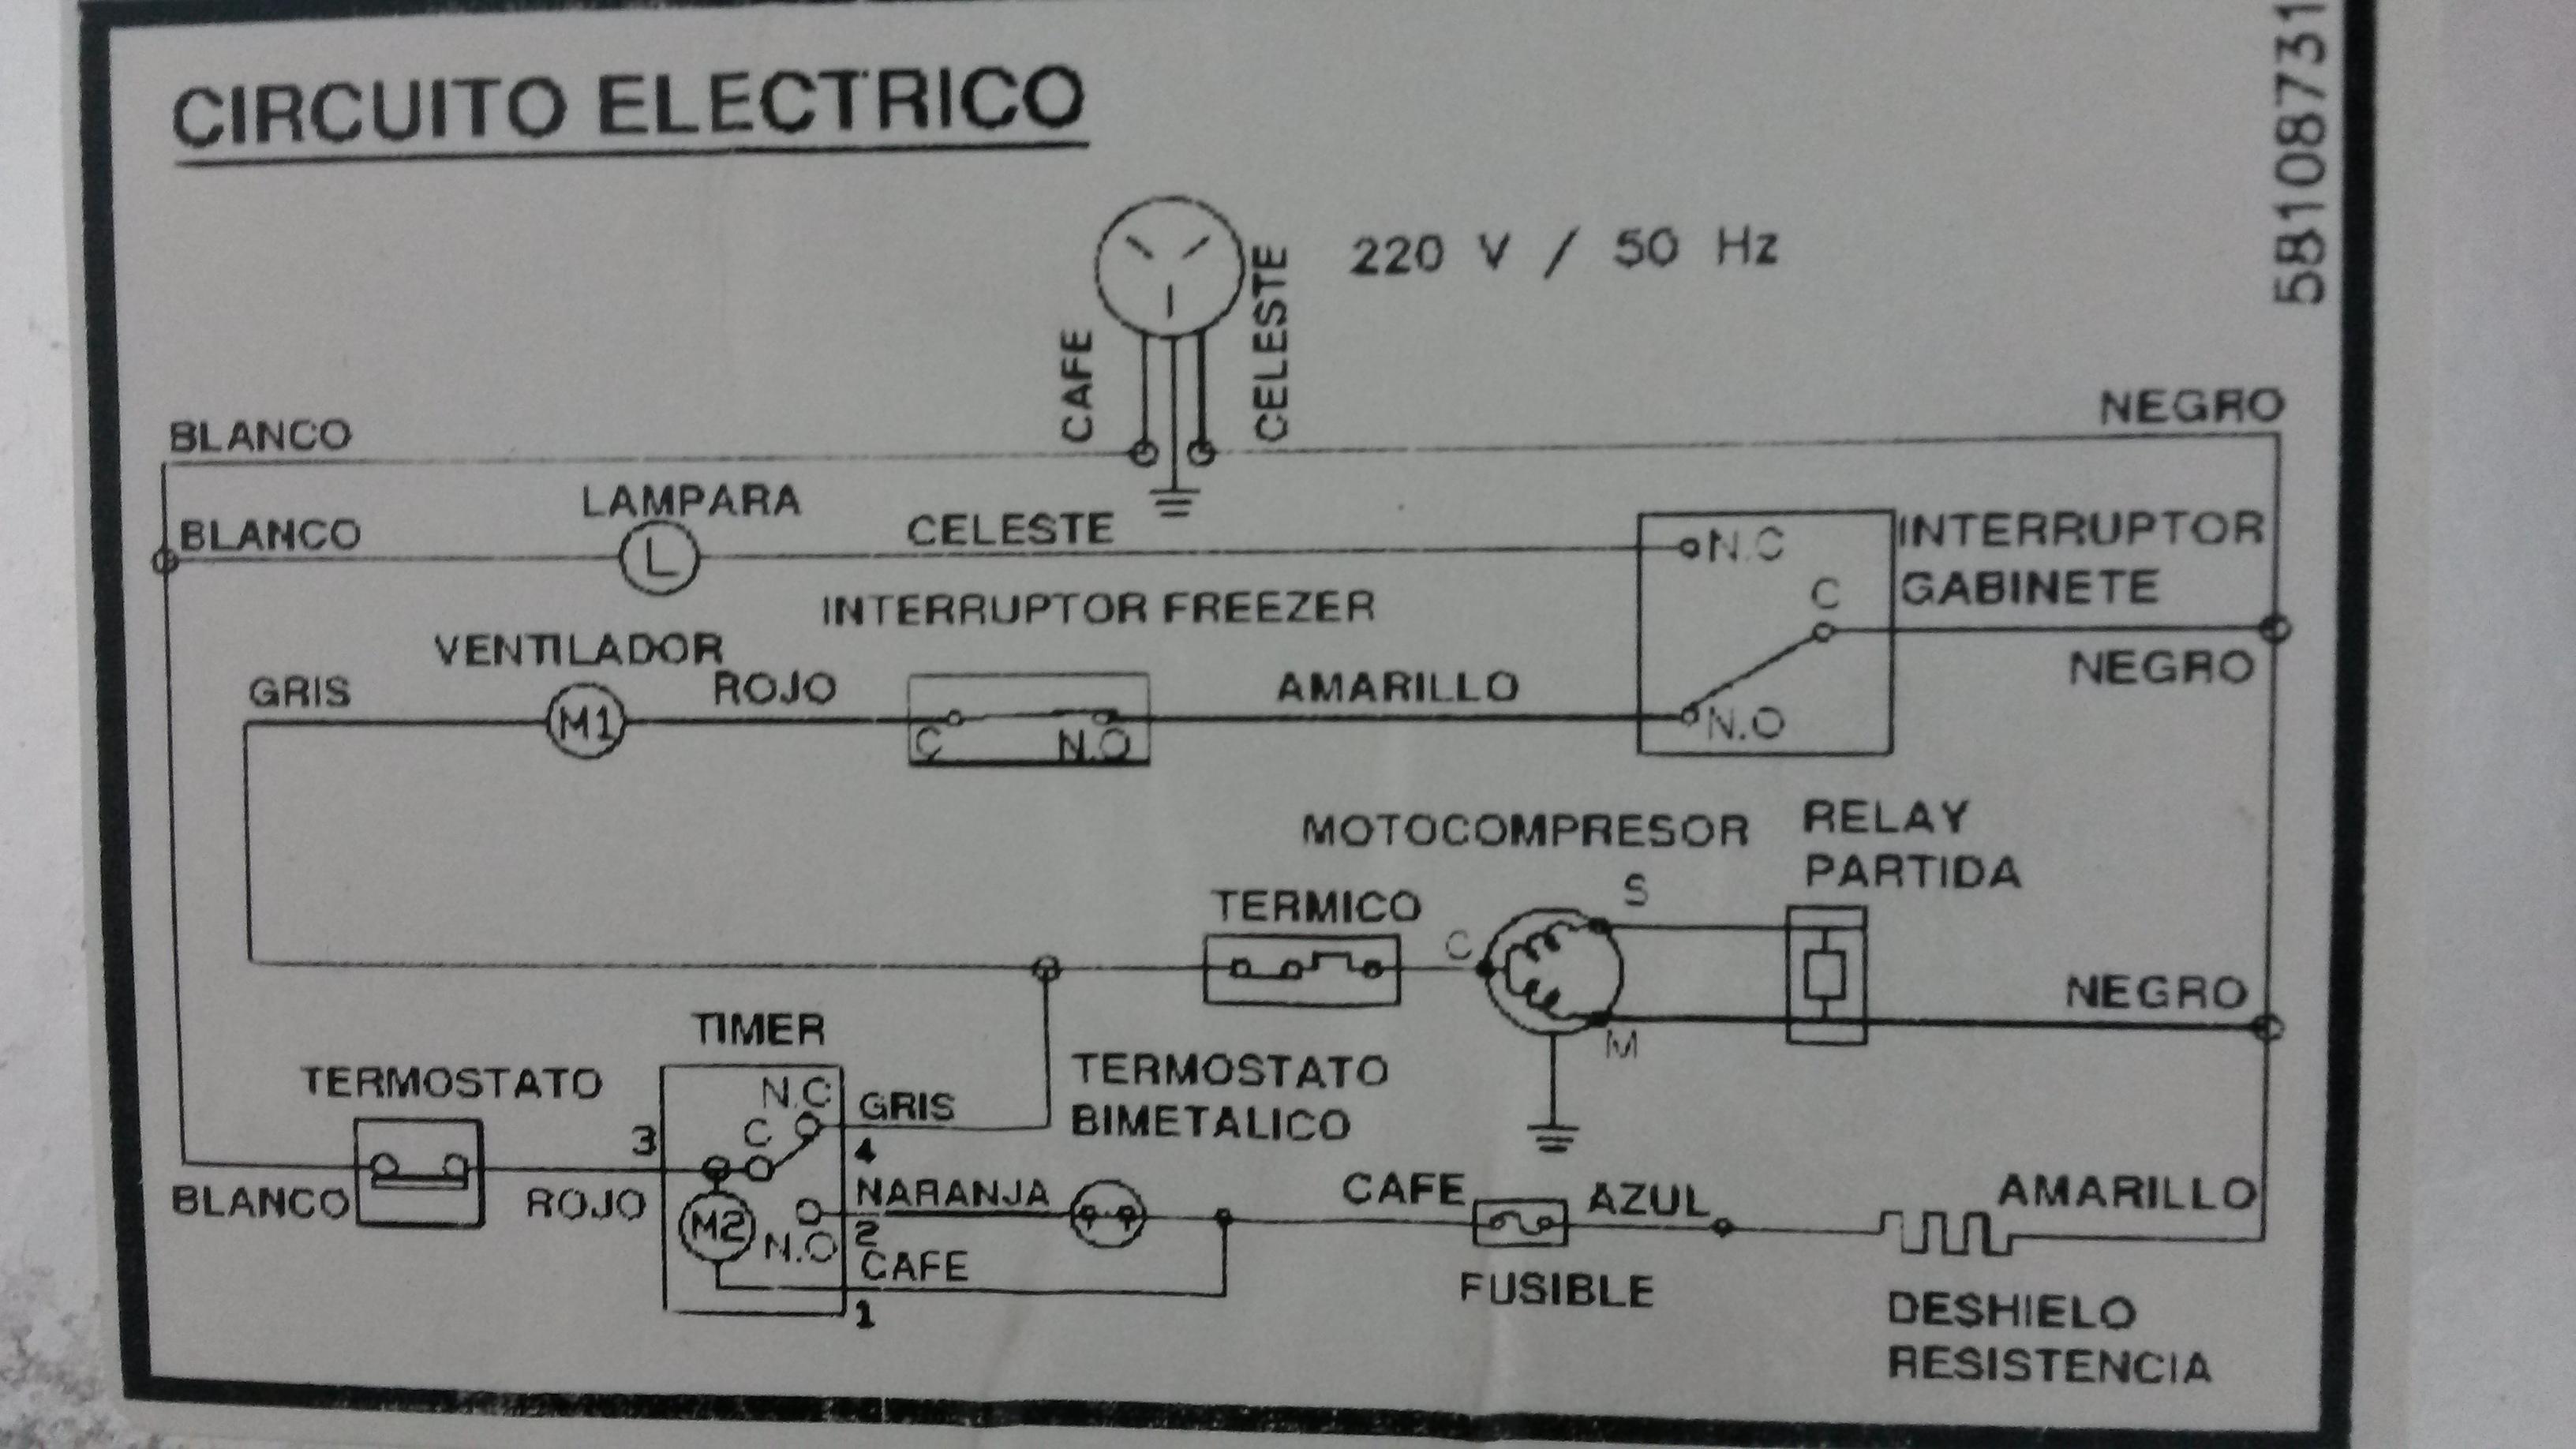 Circuito Electrico Heladera Comercial : Enchufar timer heladera no frost yoreparo